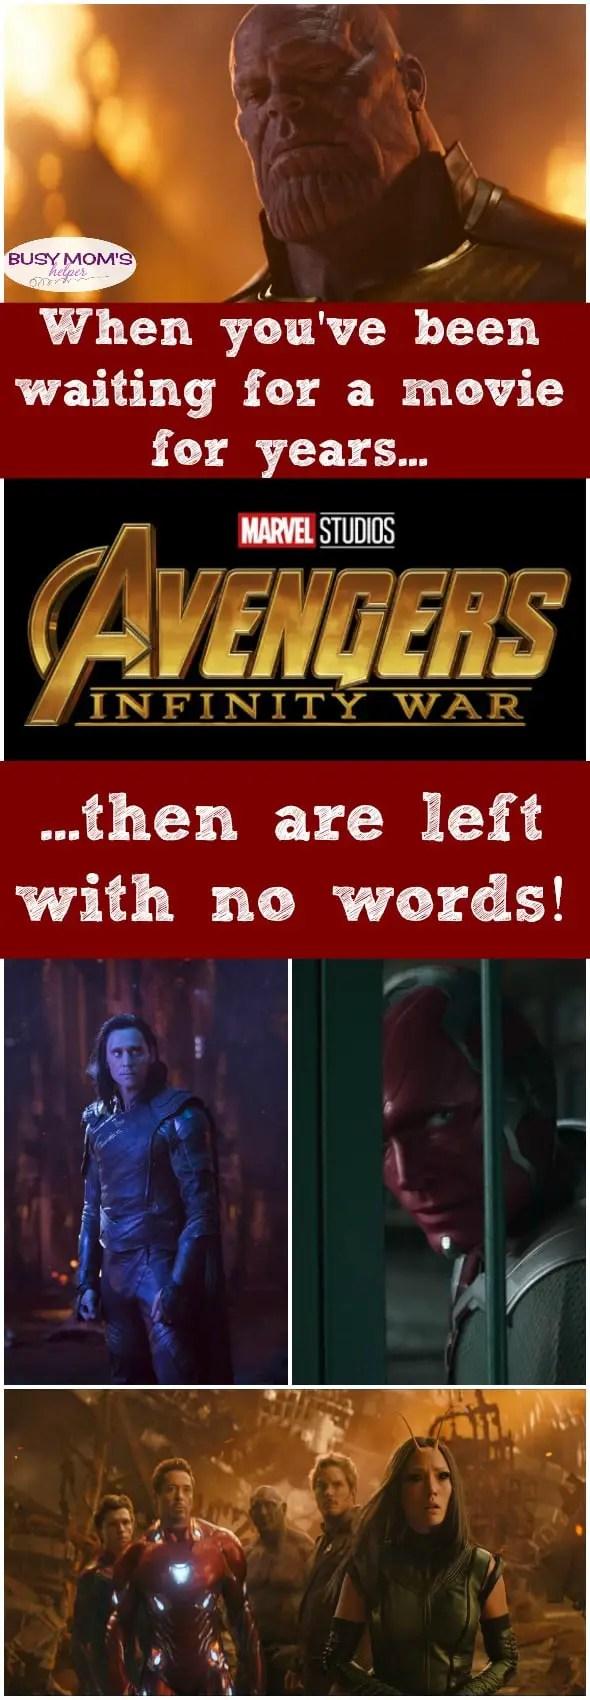 Speechless about Avengers Infinity War #infinitywar #disneypartner #movie #marvel #avengers #superhero #theater